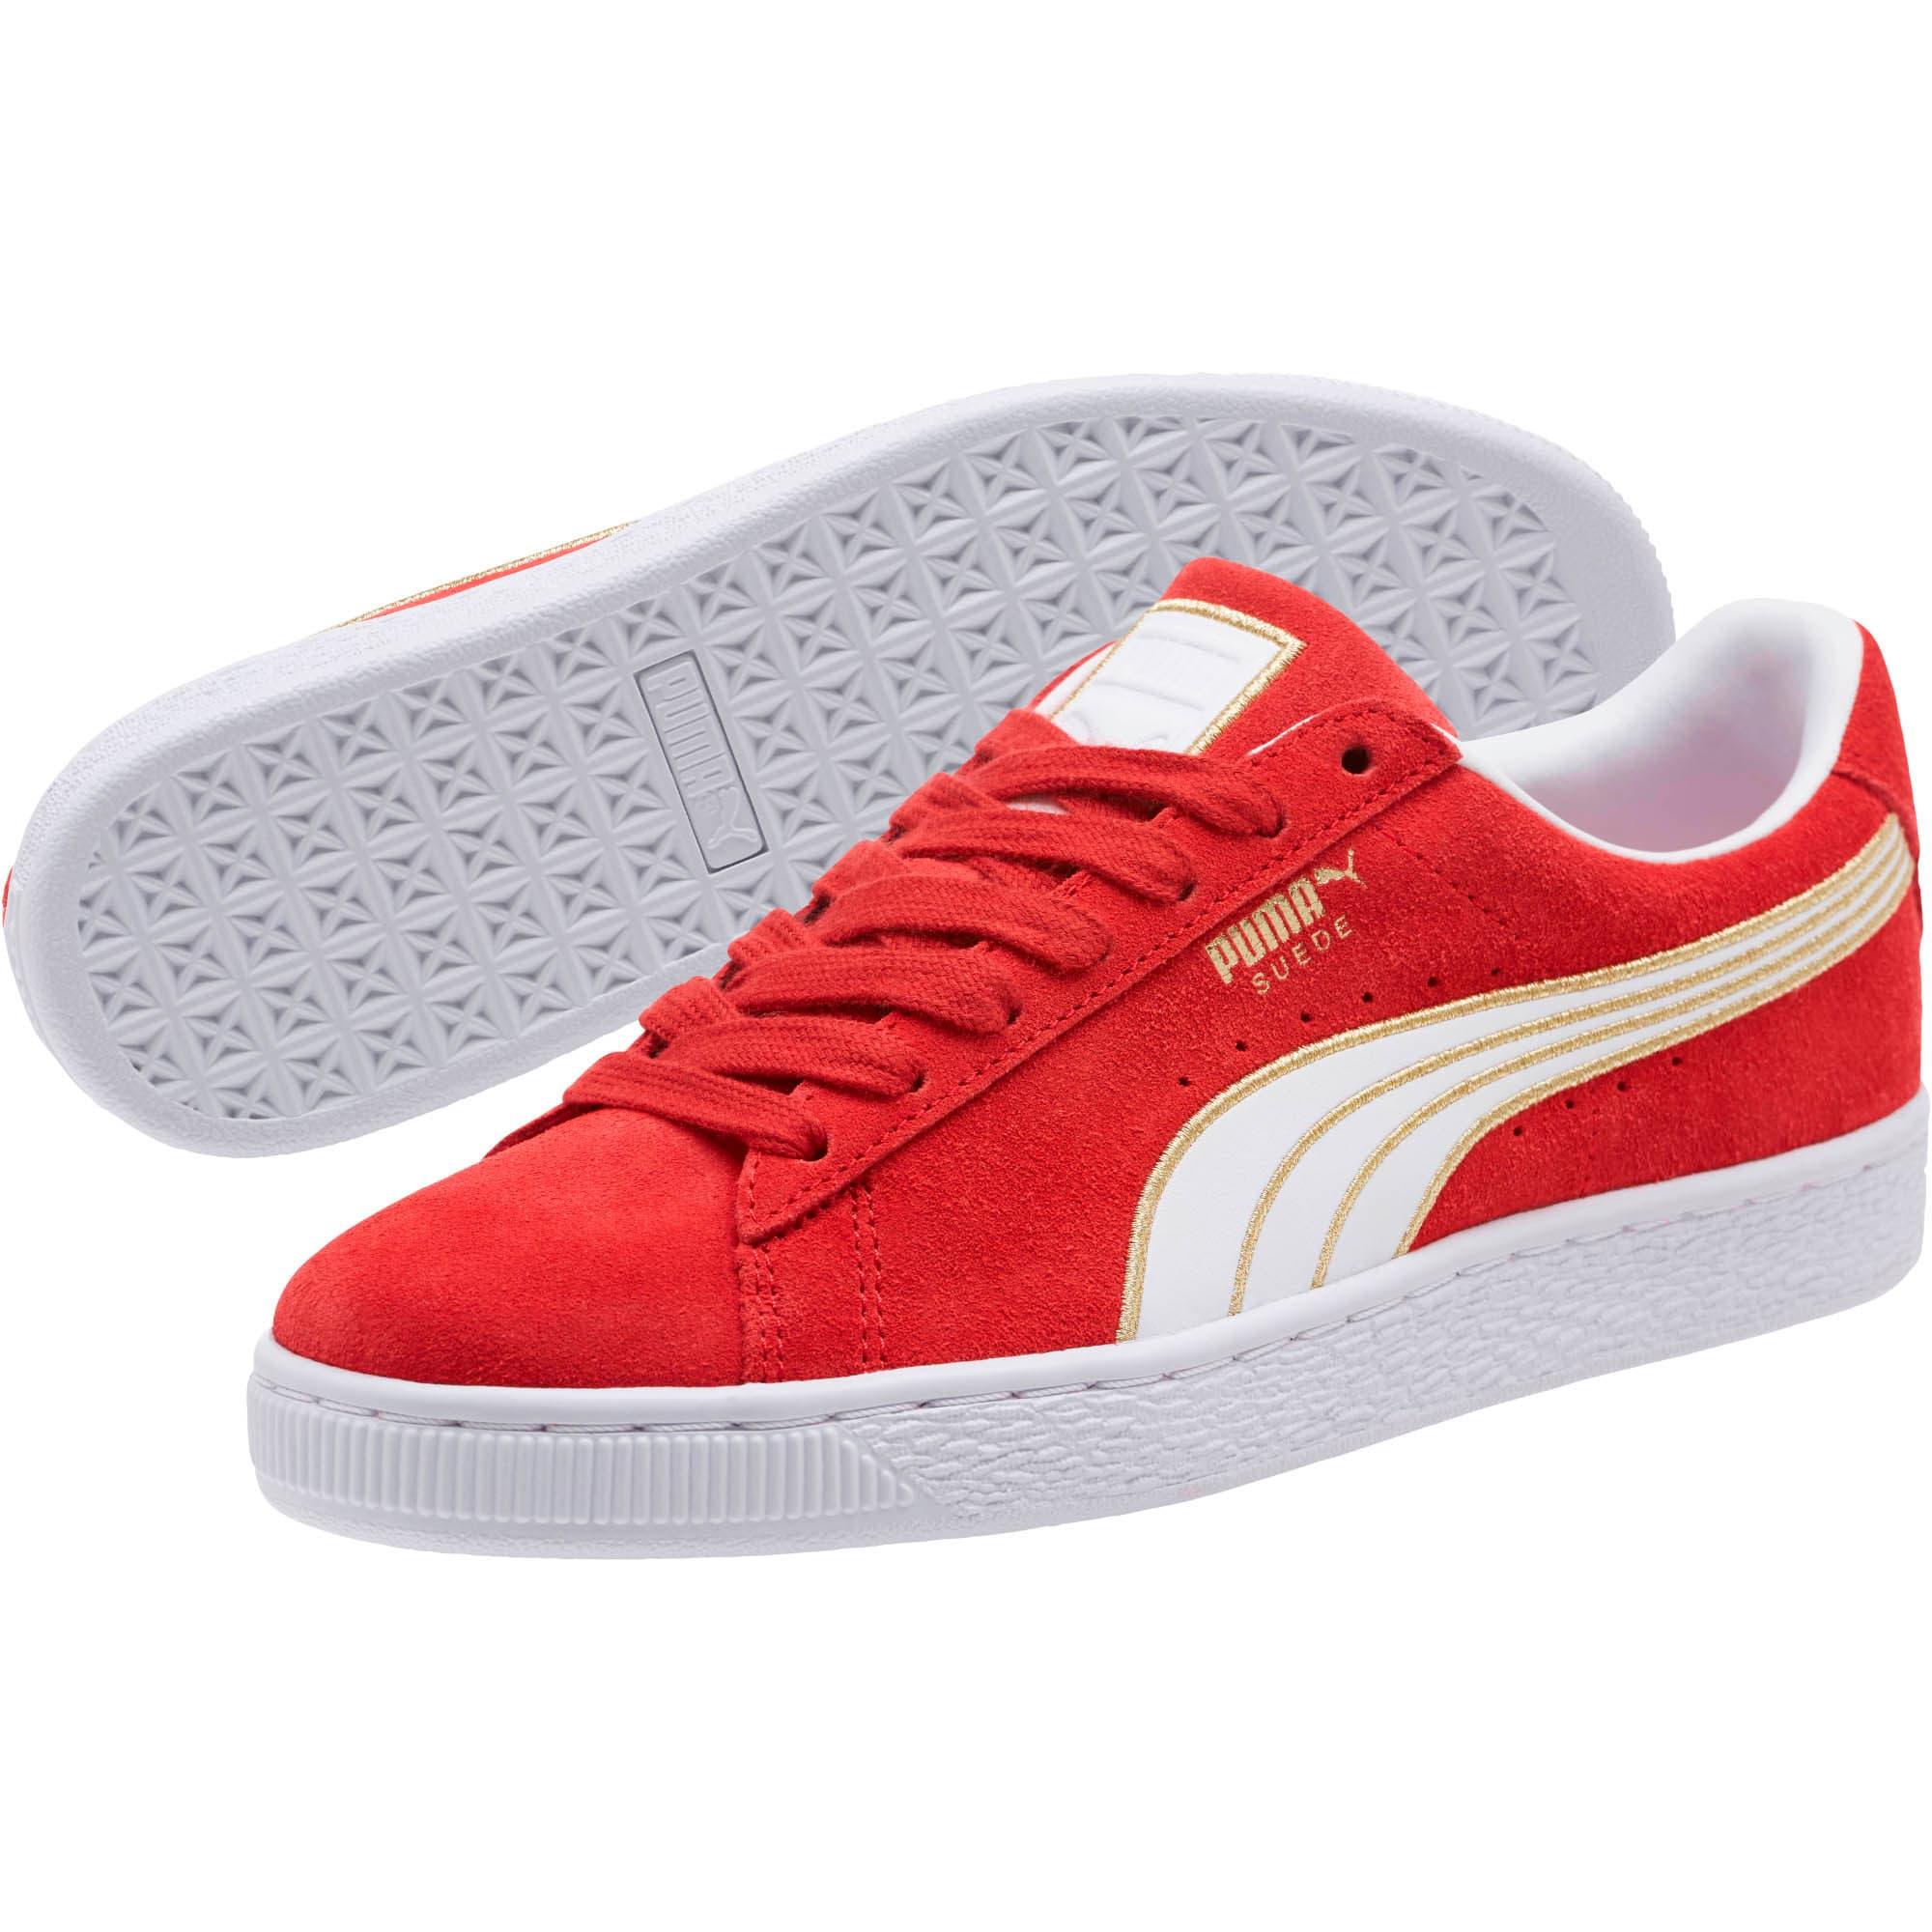 Thumbnail 2 of Suede Varsity Women's Sneakers, Ribbon Red-Puma White, medium